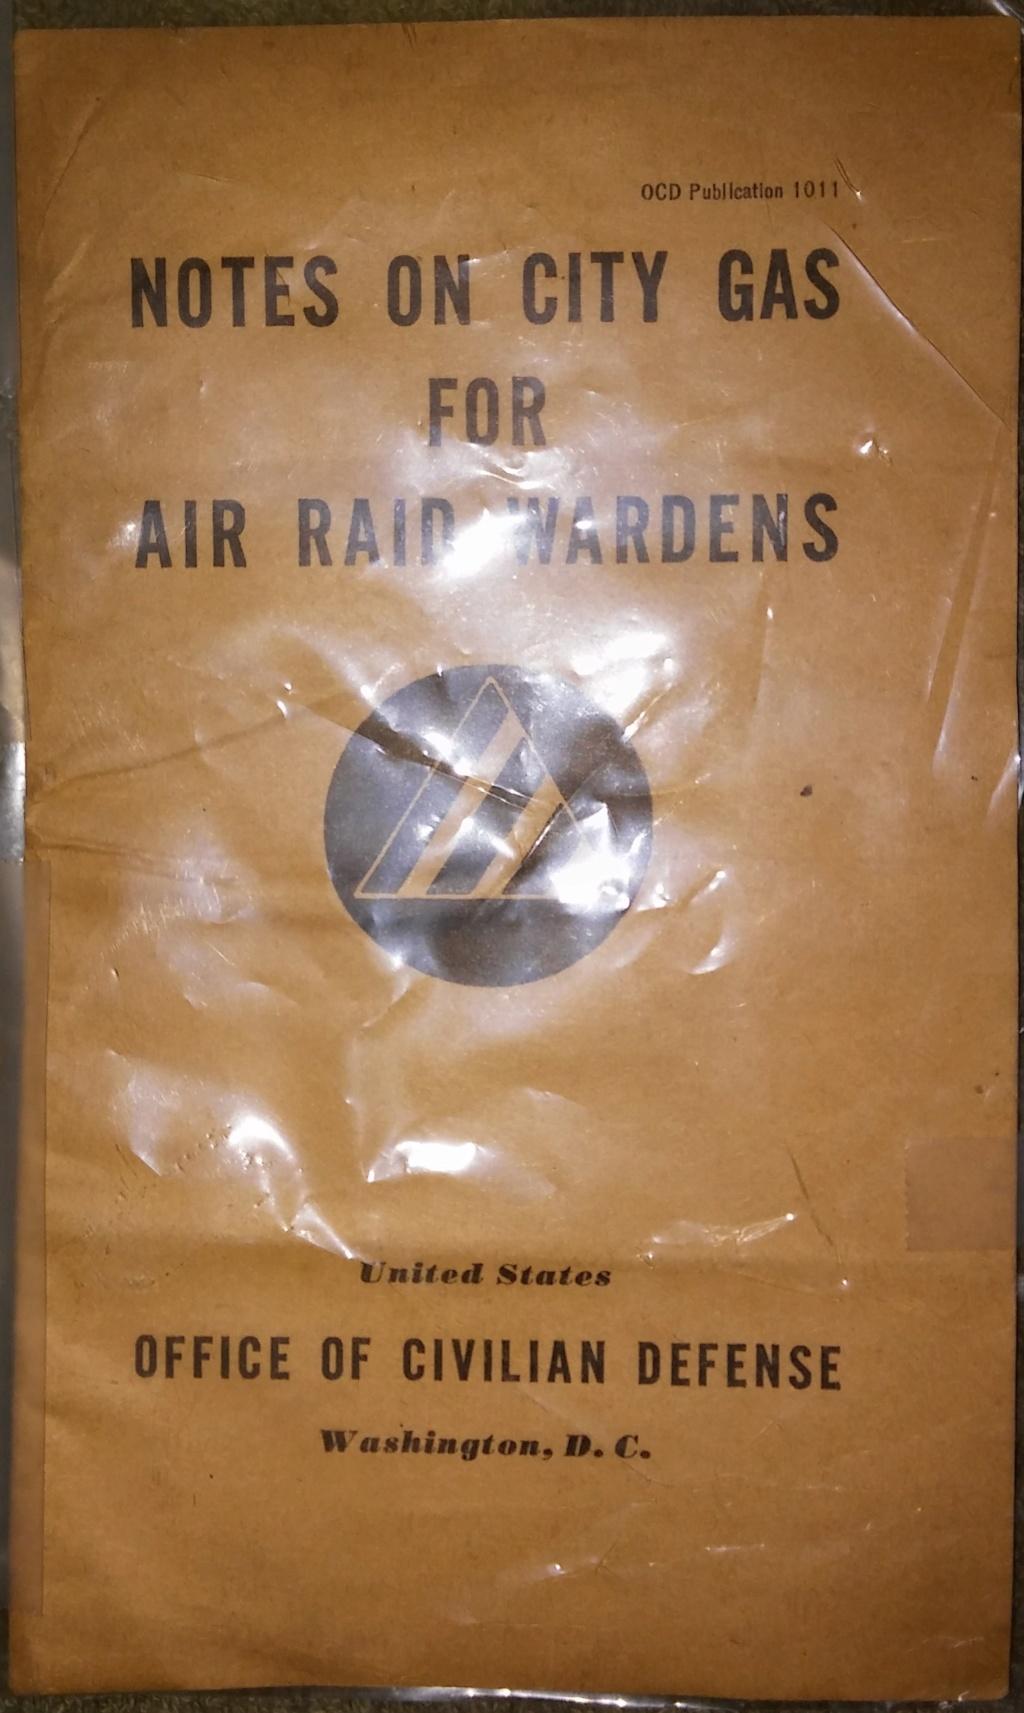 Some randon Civil Defense stuff 20181211